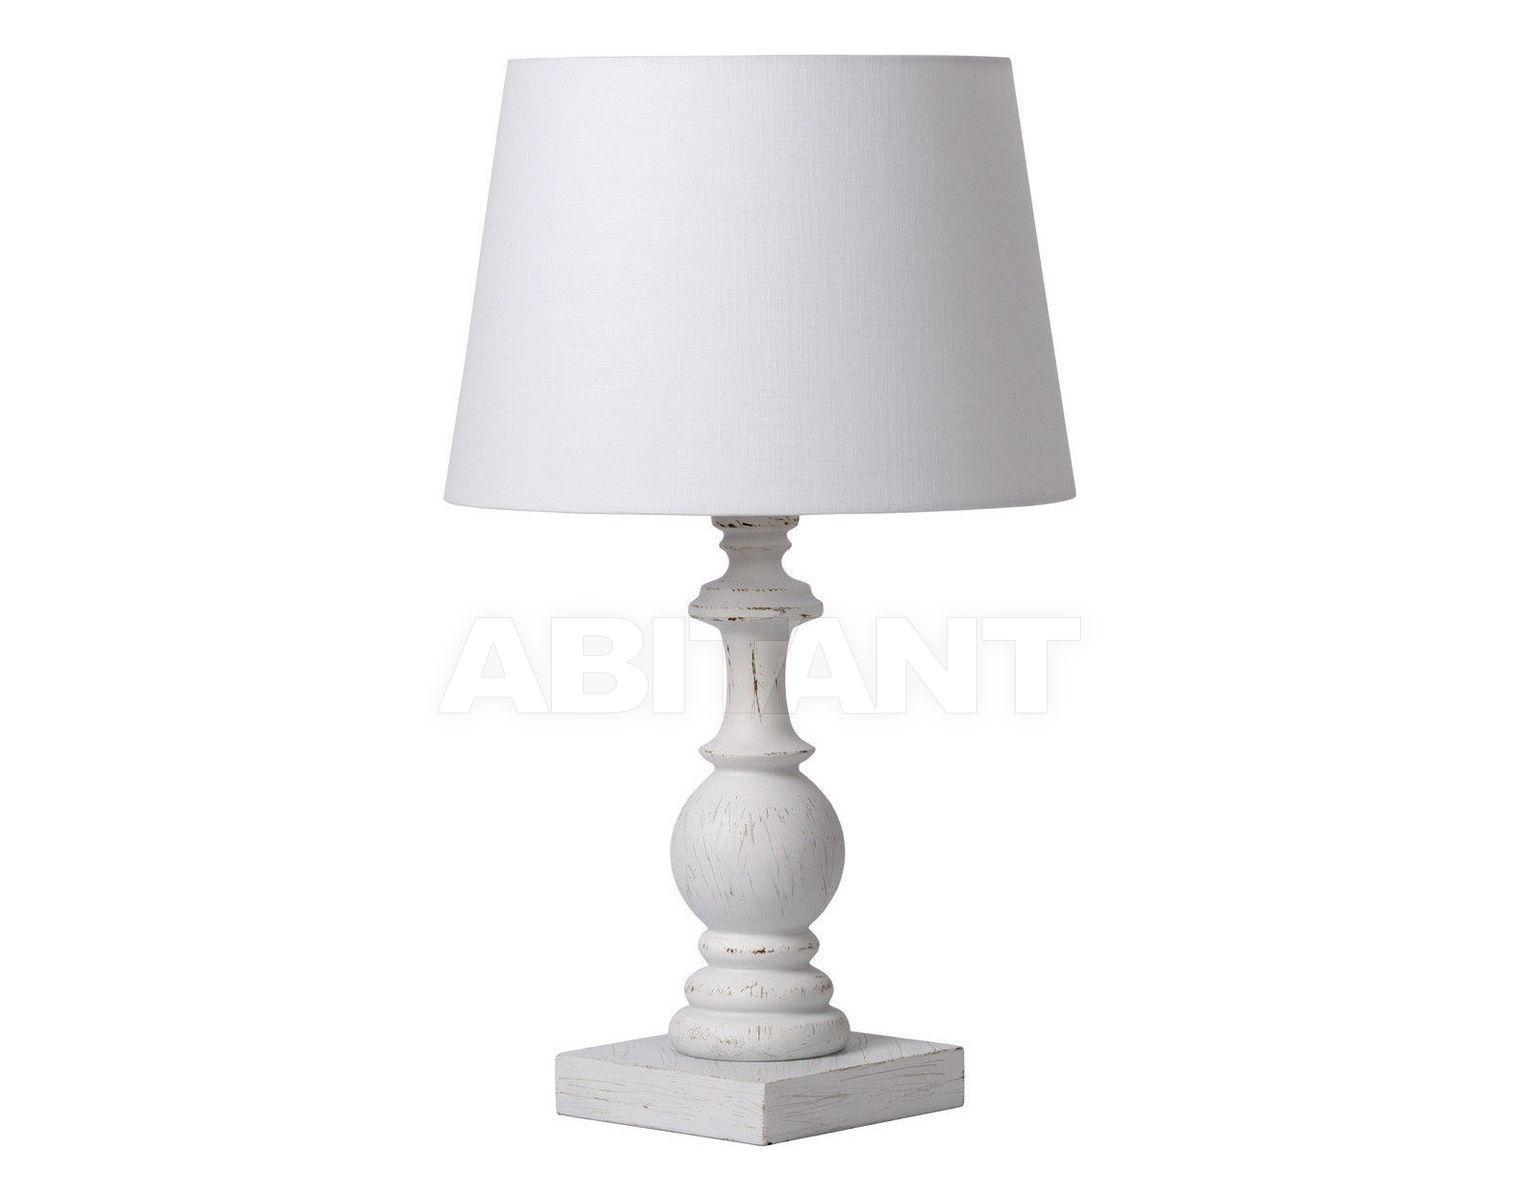 Купить Лампа настольная JOCO Lucide  Table And Floorlamps 17541/35/21